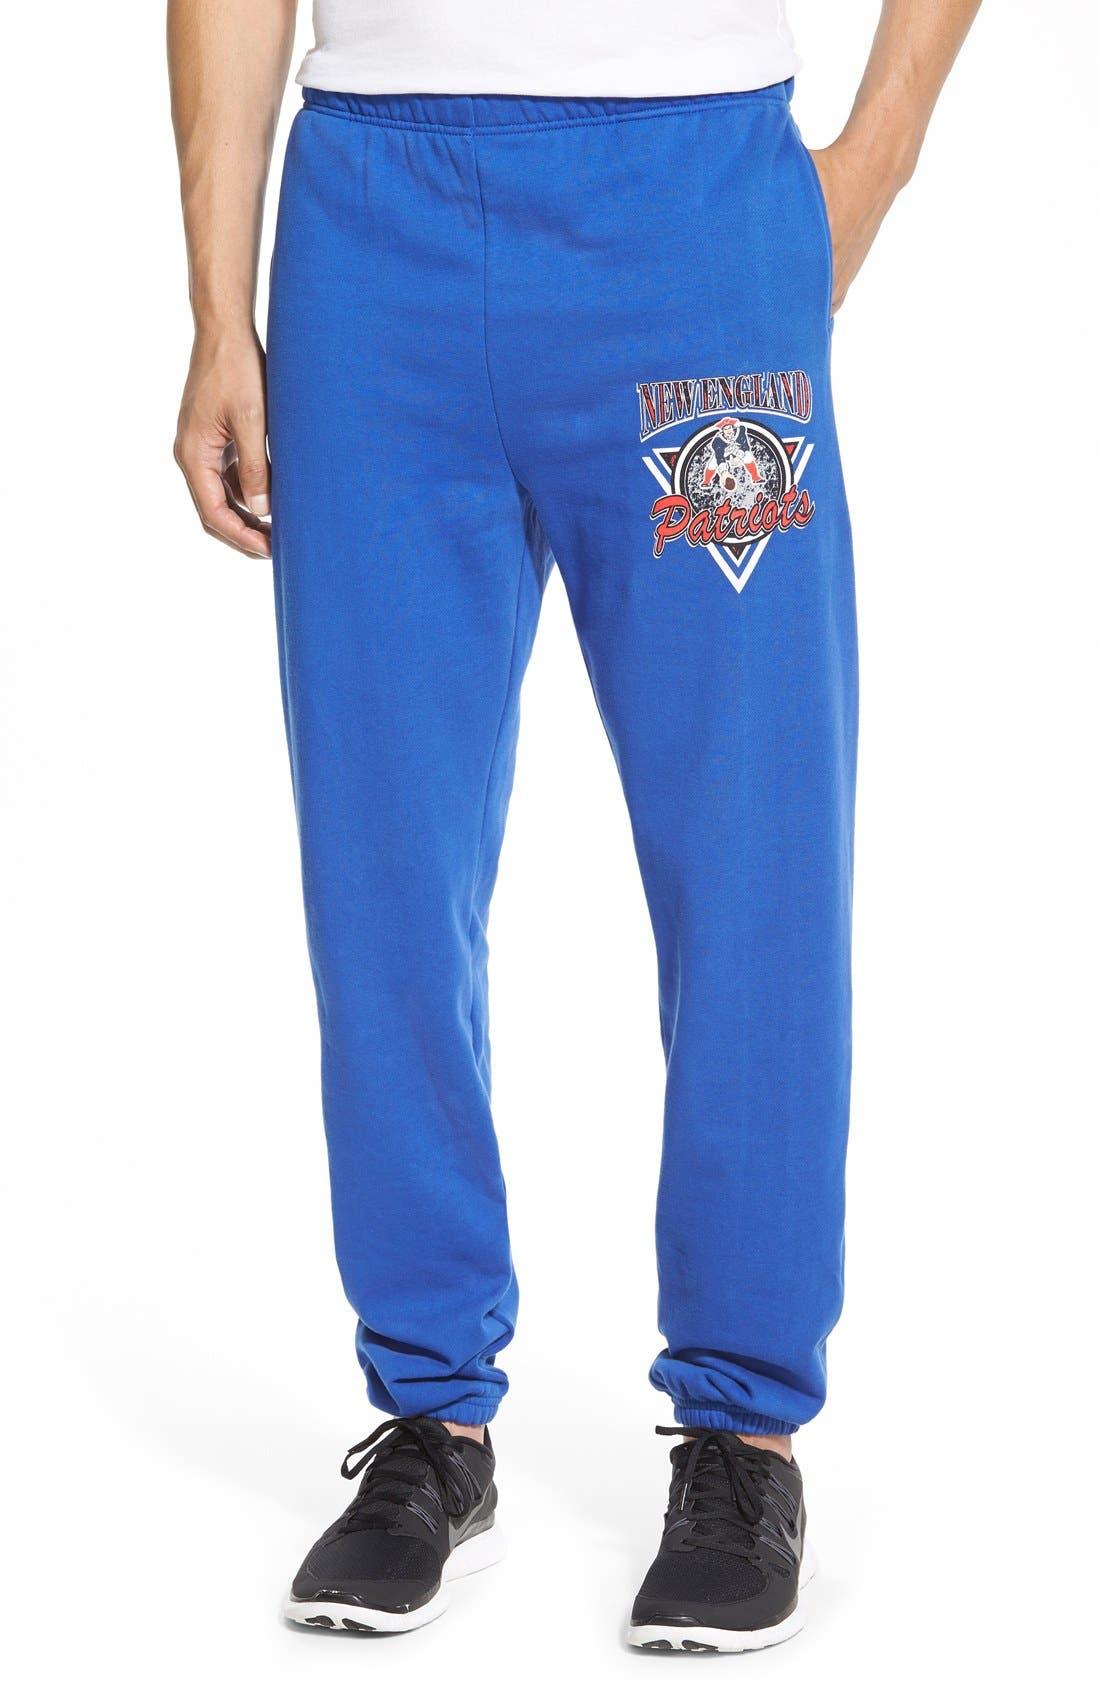 'New England Patriots' Fleece Sweatpants,                             Main thumbnail 1, color,                             430